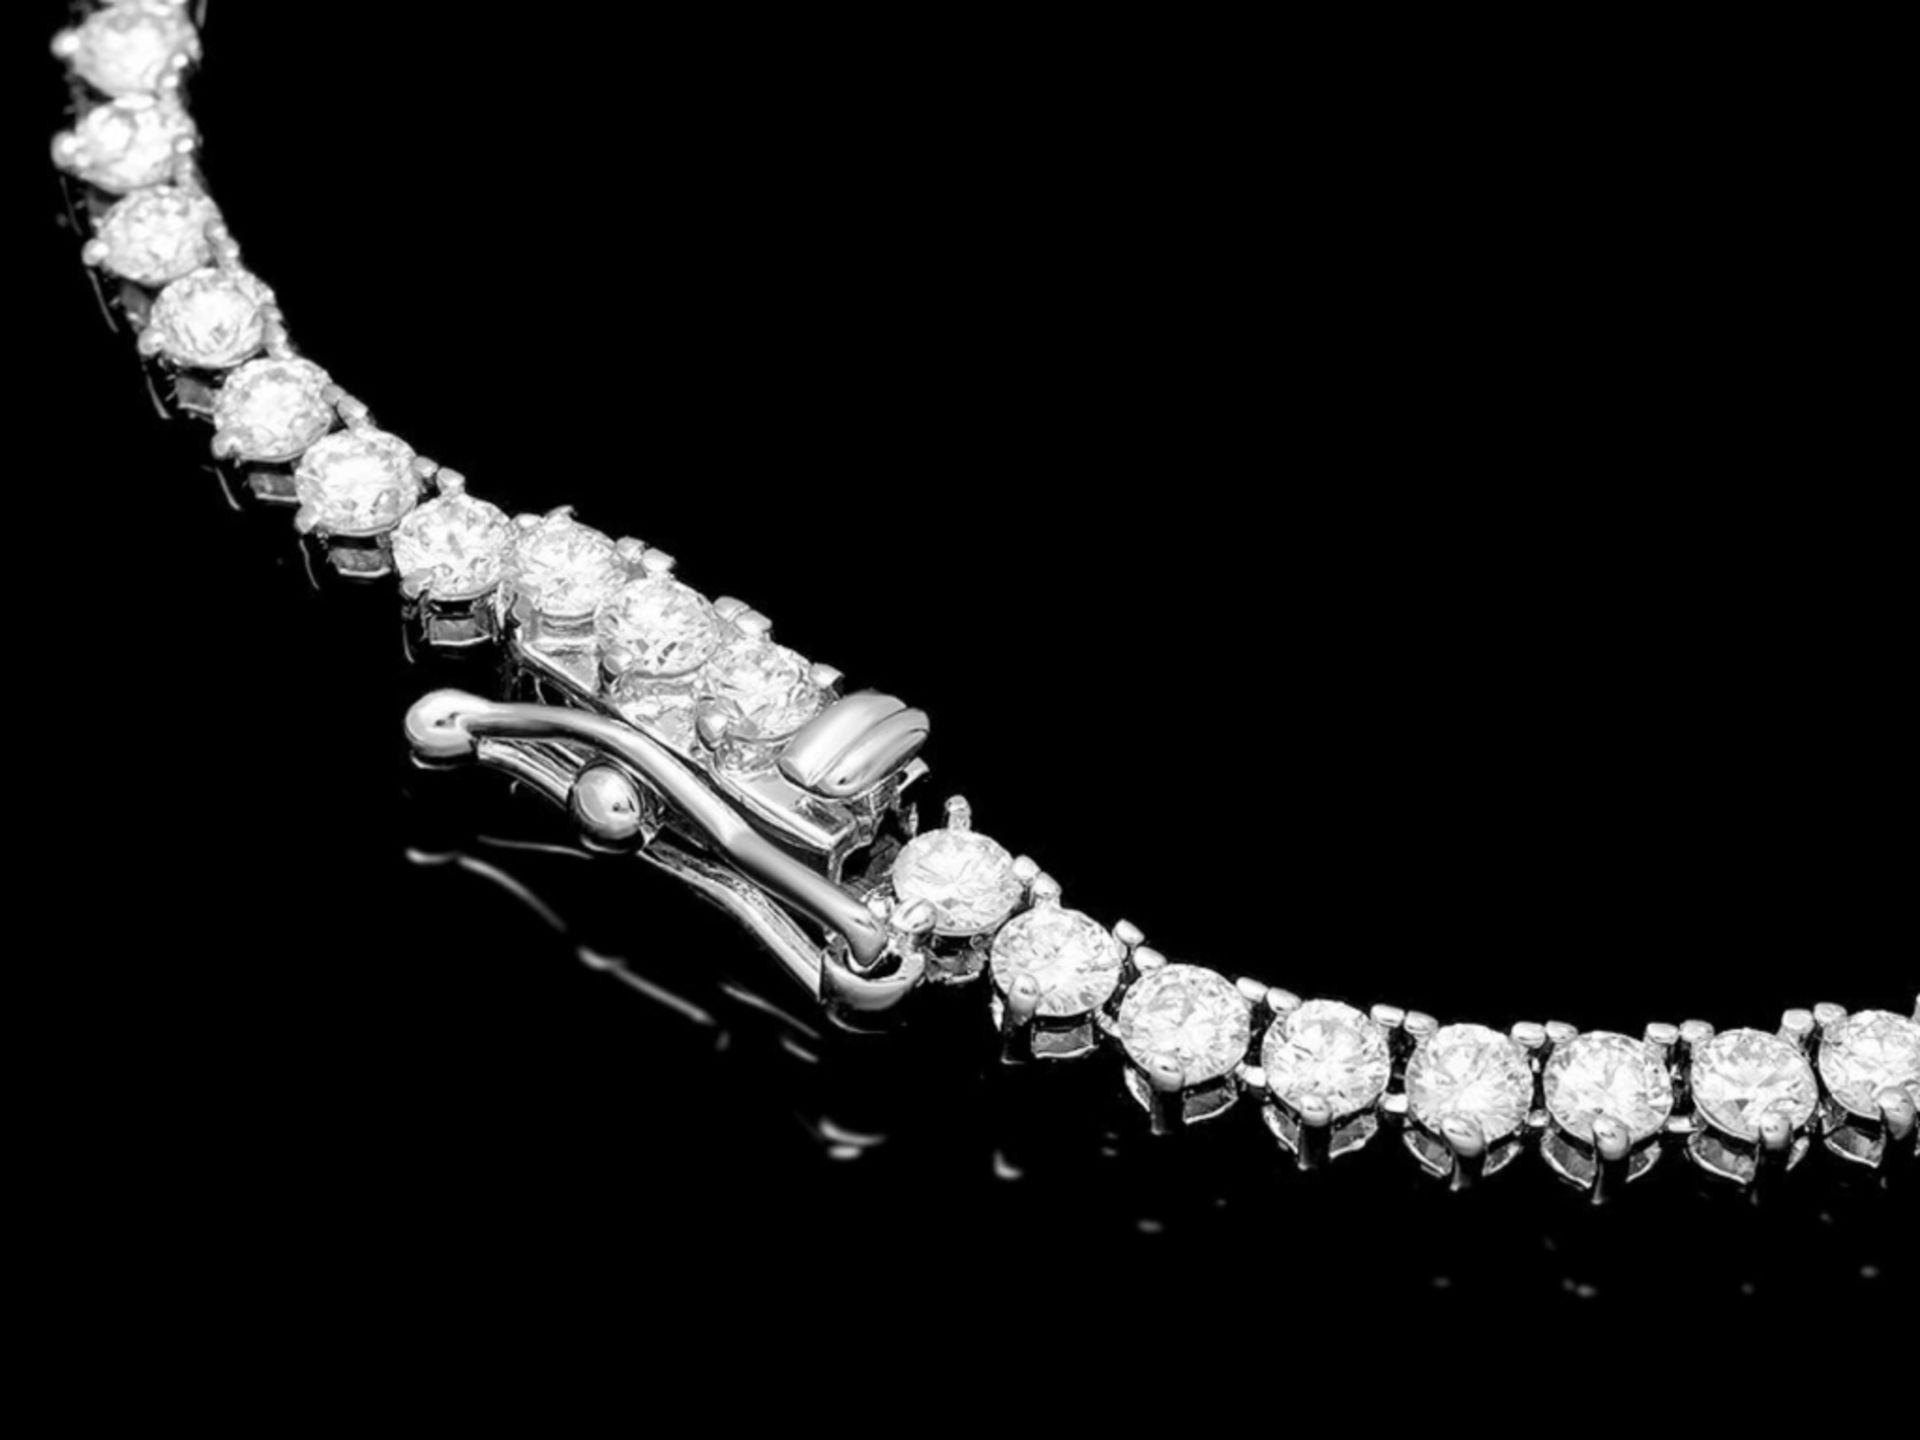 ^18k White Gold 8.00ct Diamond Necklace - Image 3 of 4